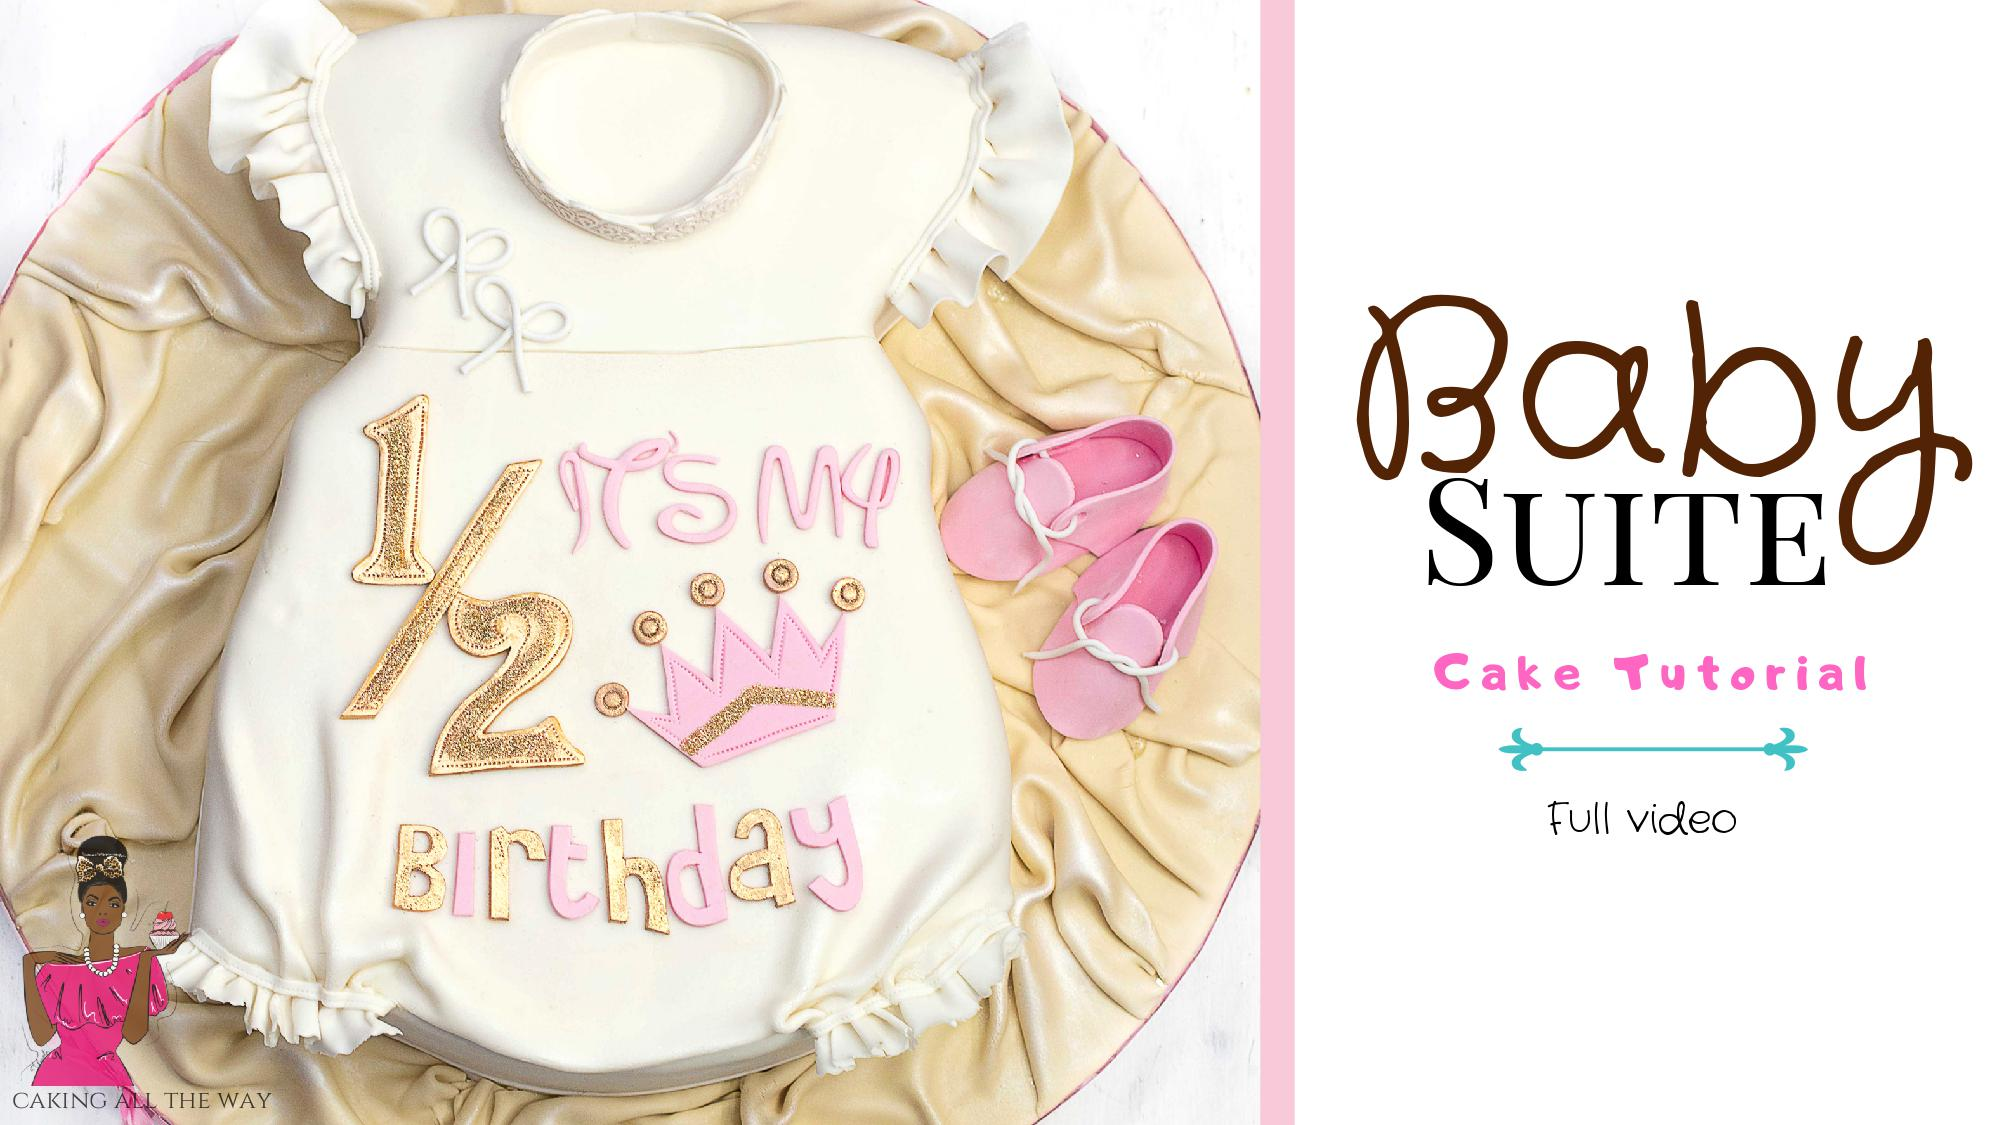 Baby Sleep Suit Cake